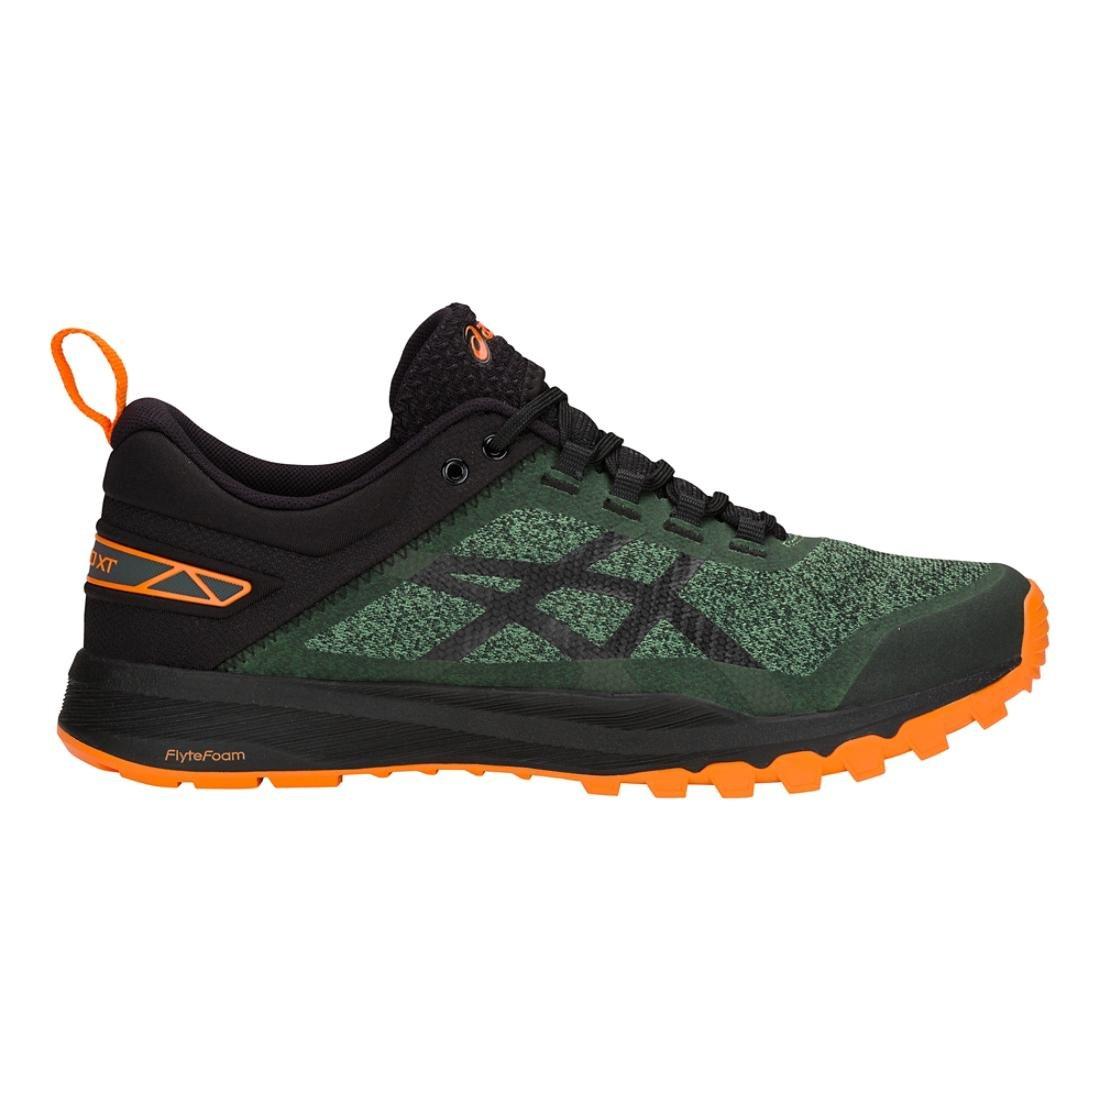 ASICS Gecko XT Men's Running B077MQ6BJF 10 M US|Cedar Green/Black